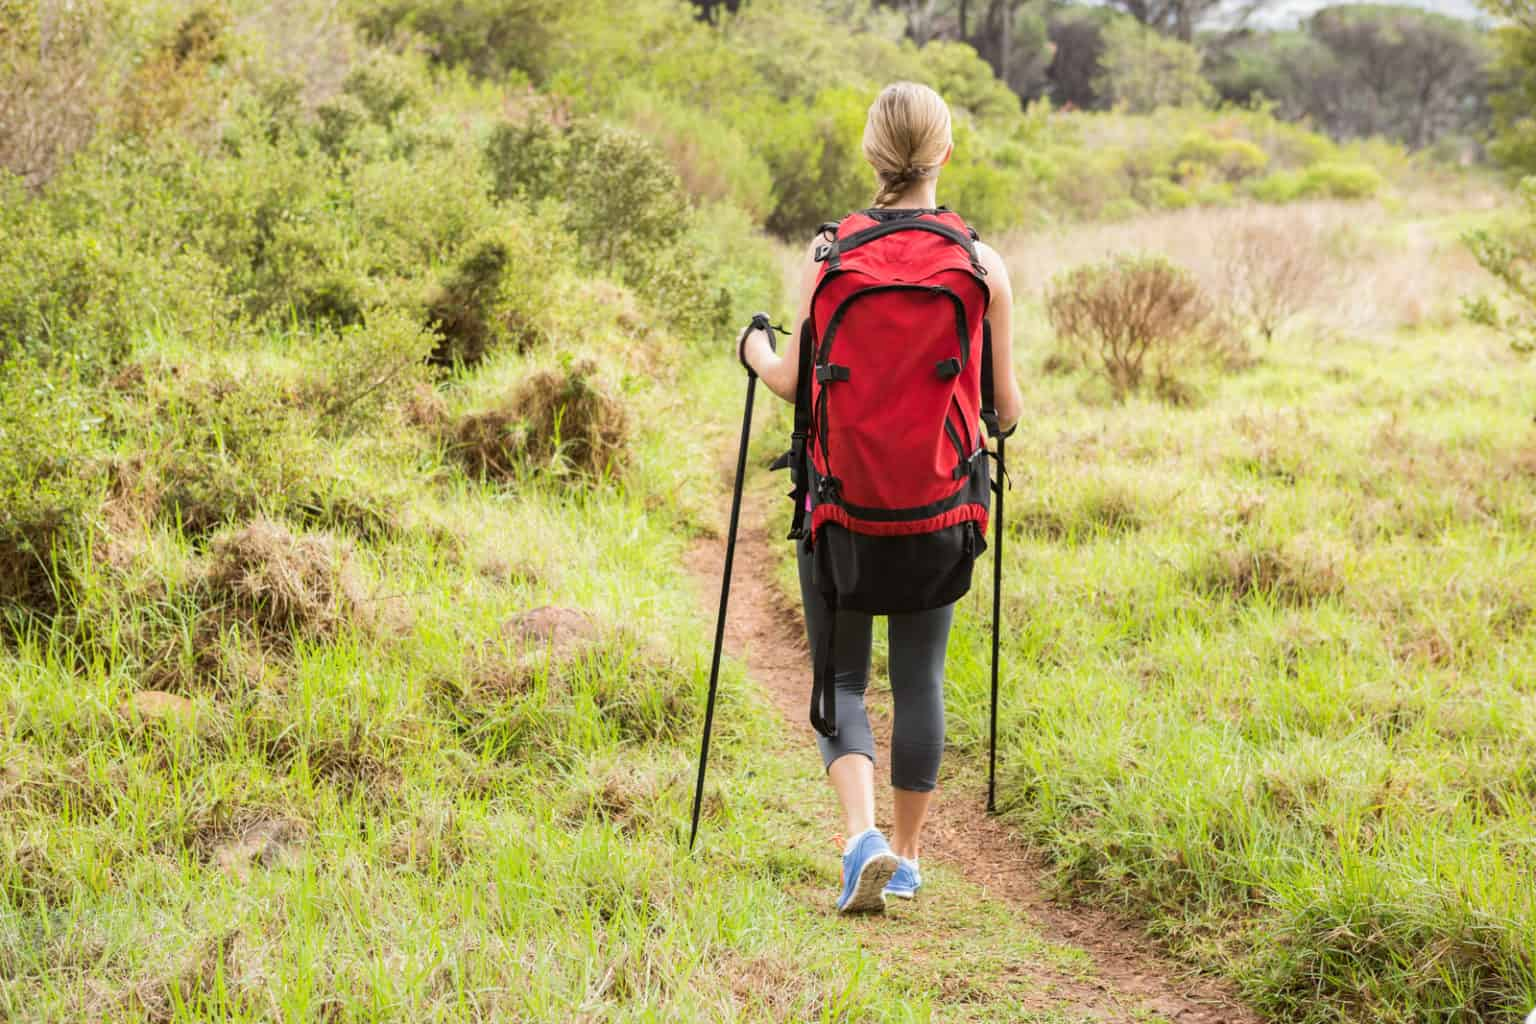 carbon fiber trekking or aluminum trekking poles